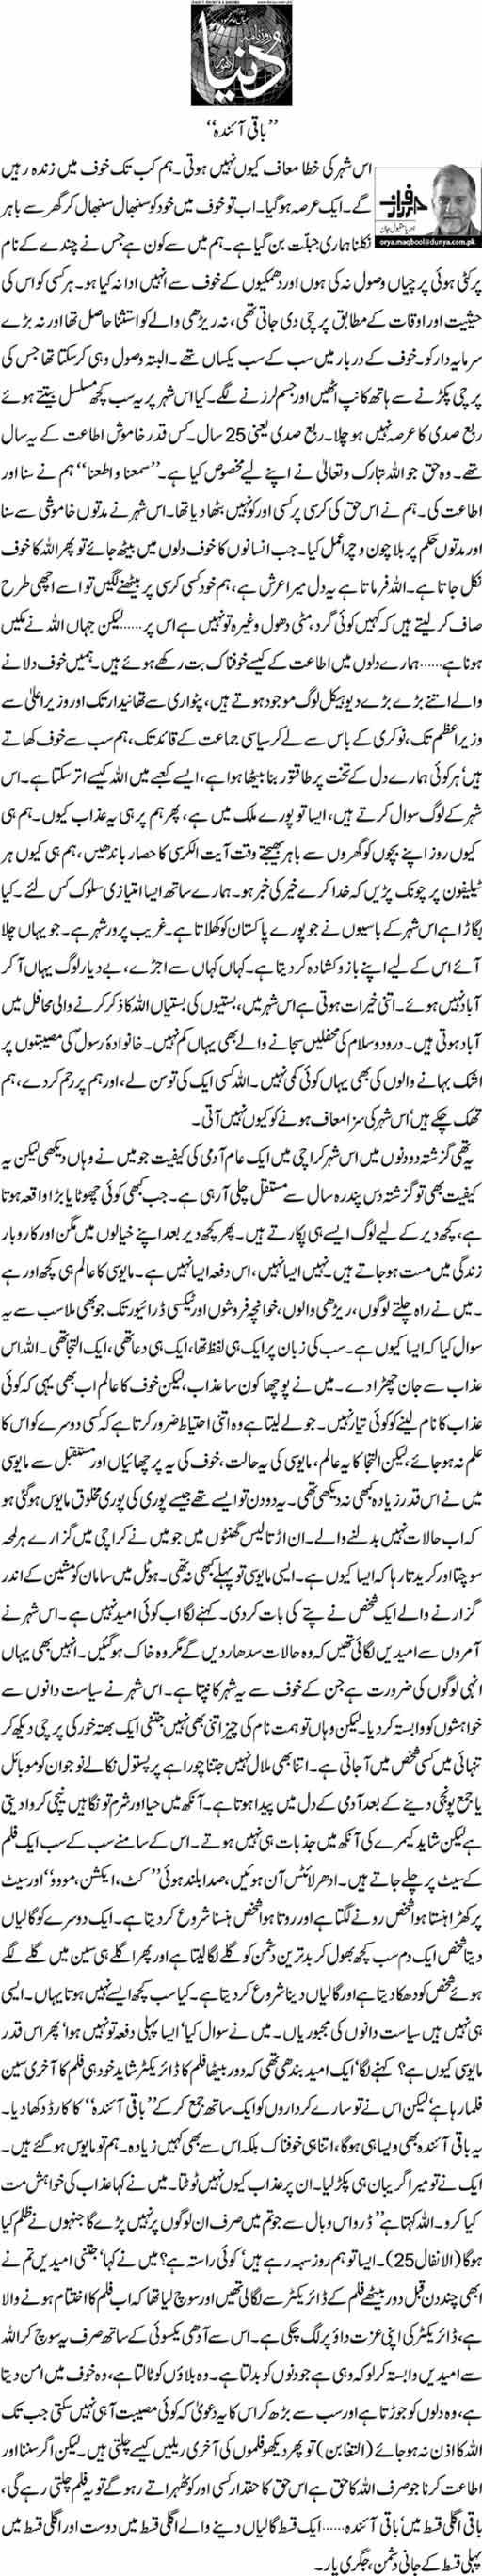 """Baki Aainda"" - Orya Maqbool Jan"